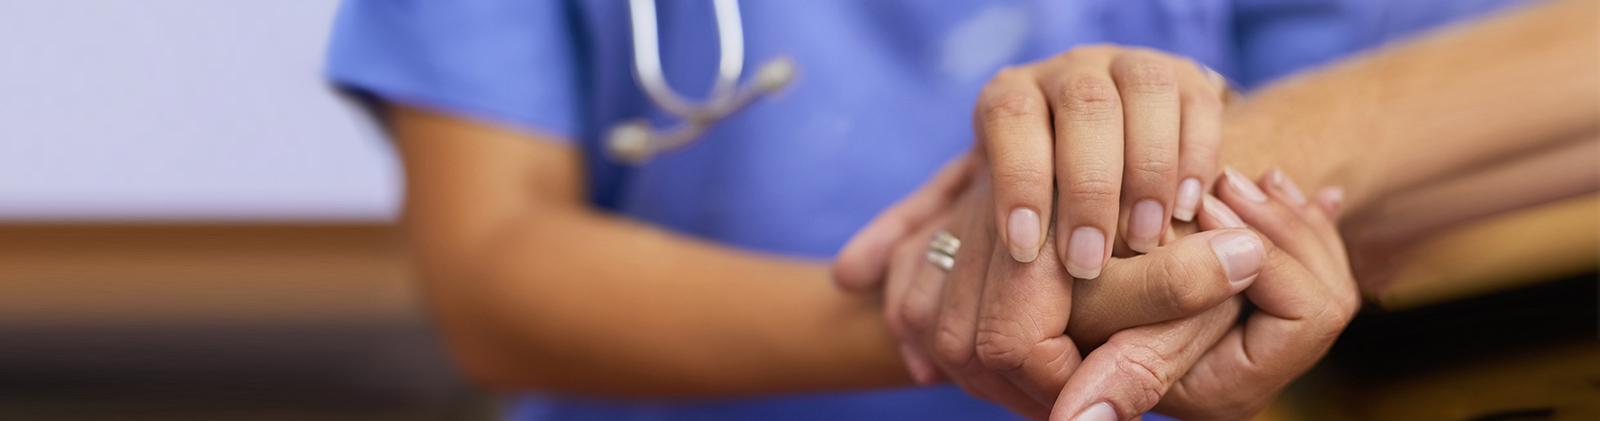 Health Benefit Insurance Plans